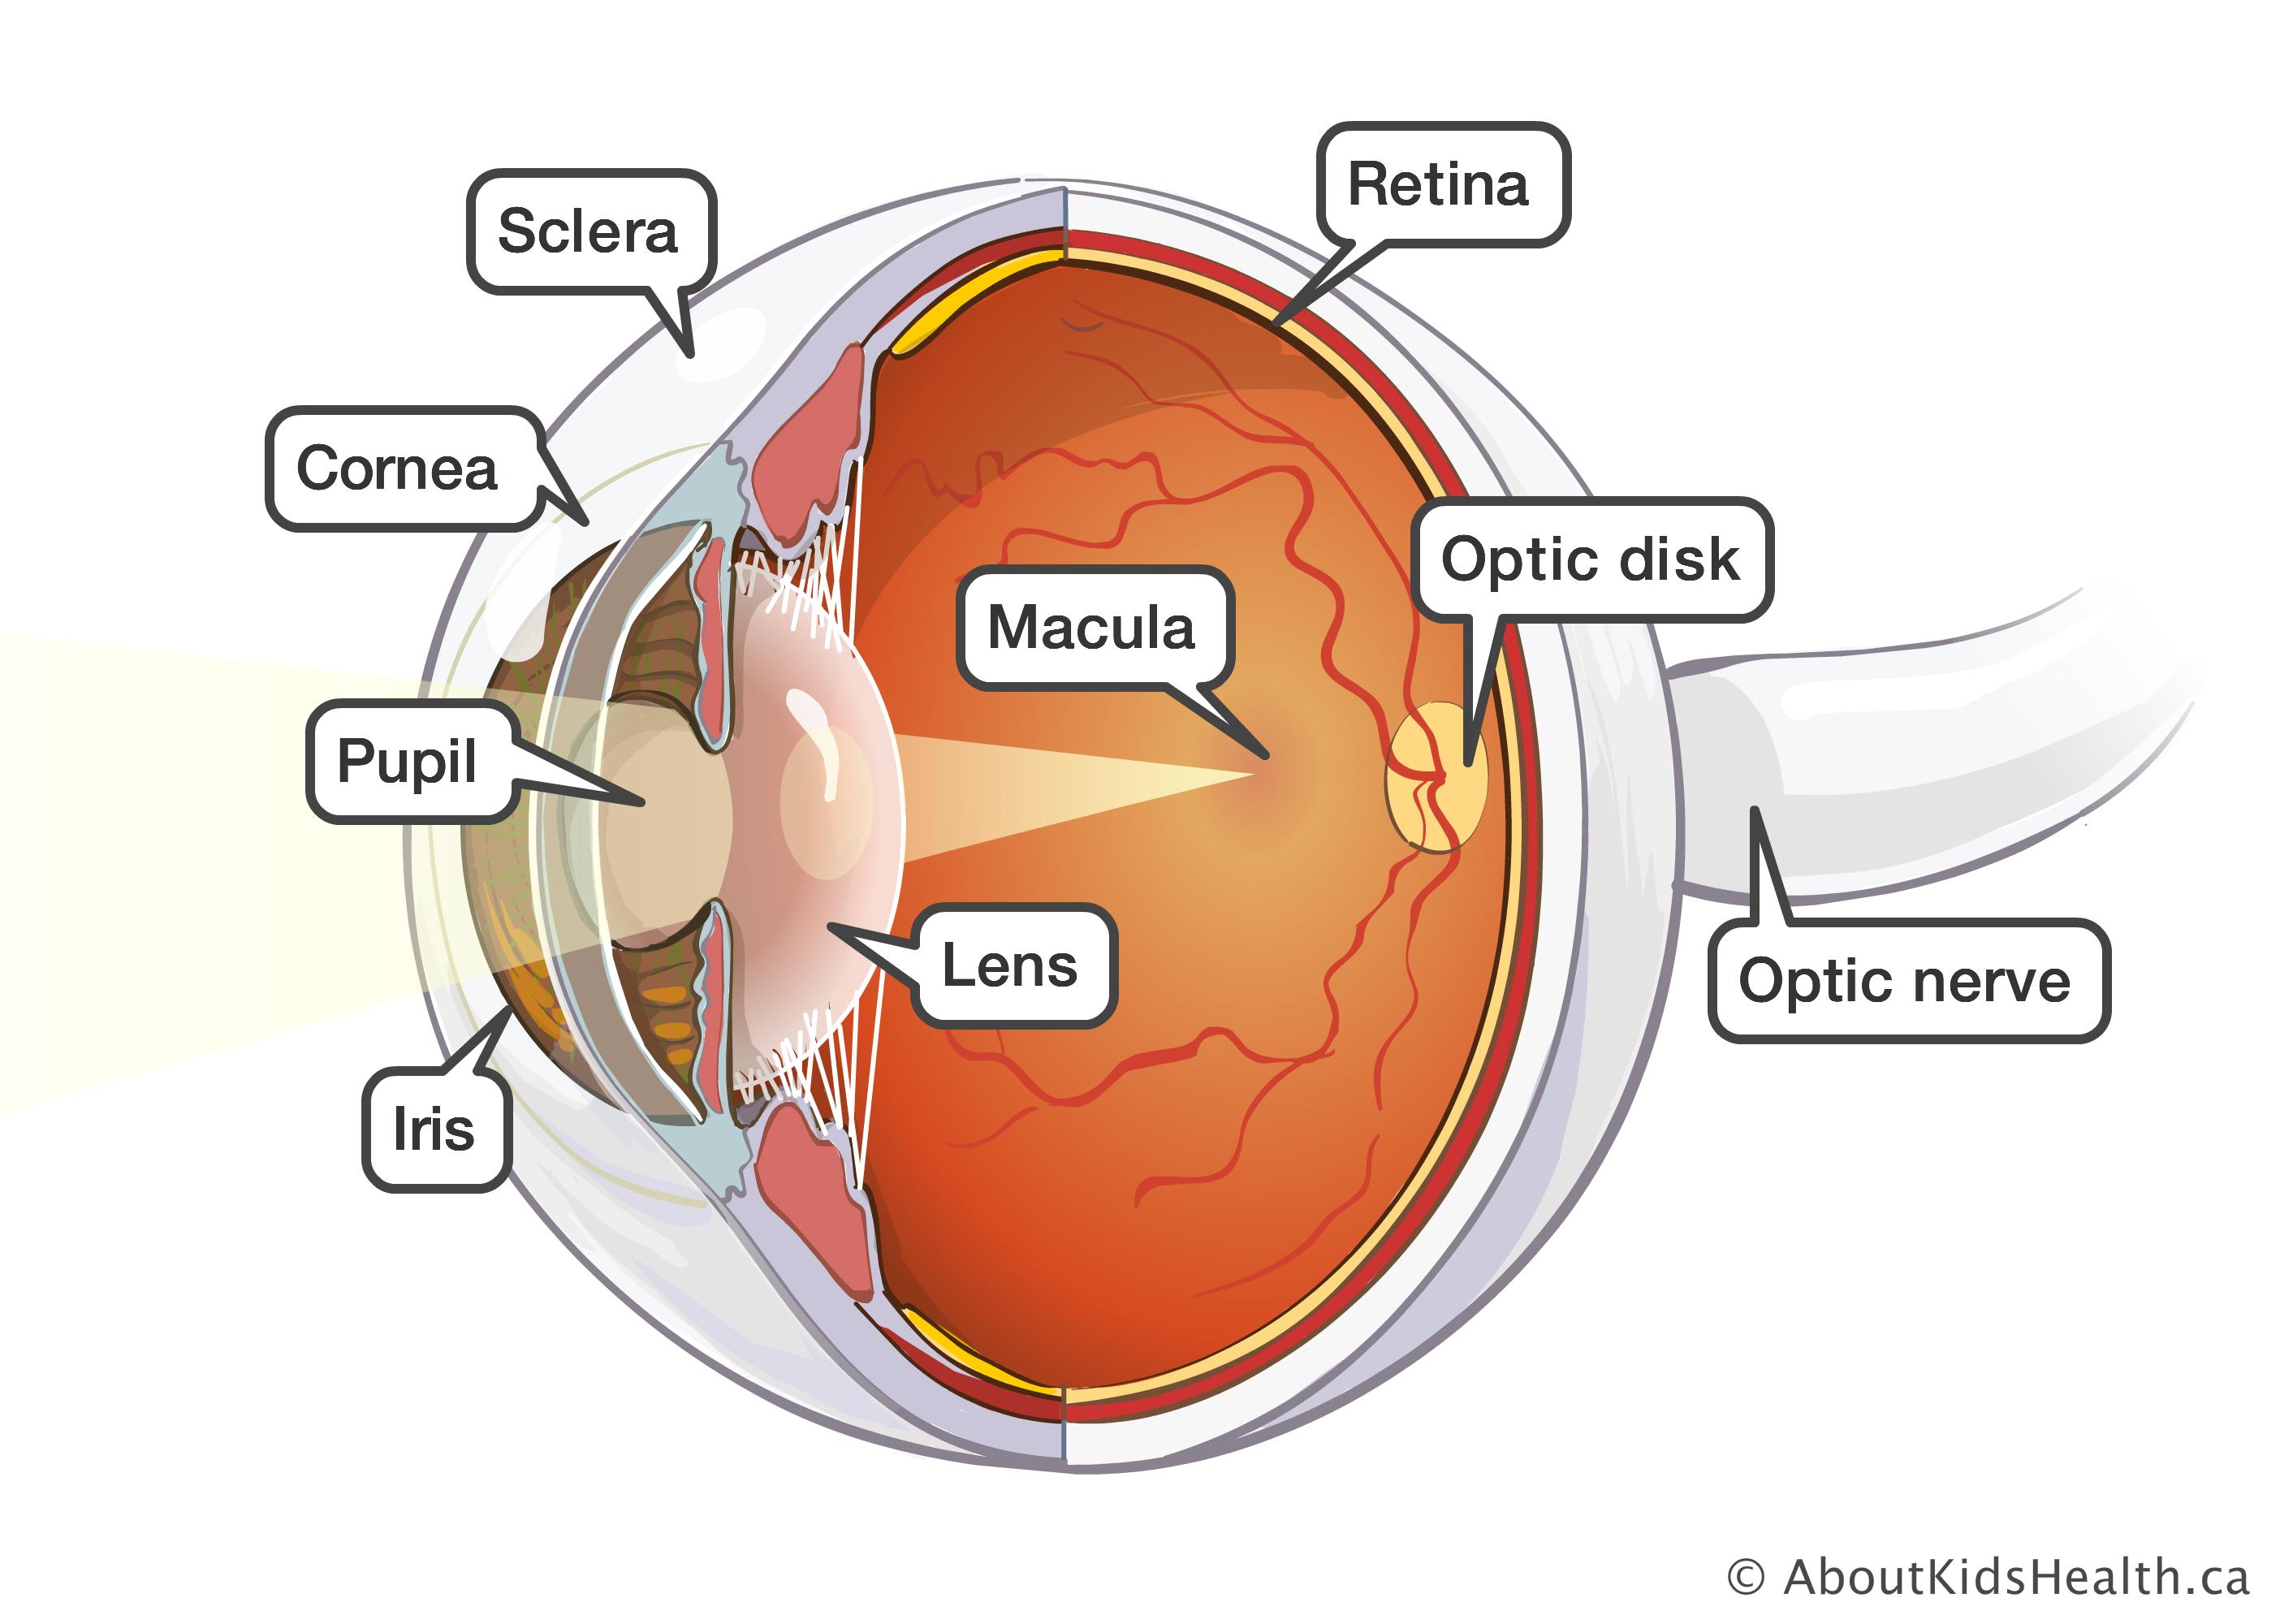 parts of the eye diagram and function 2003 honda crv wiring anatomy location optic nerve desk retina macula lens iris